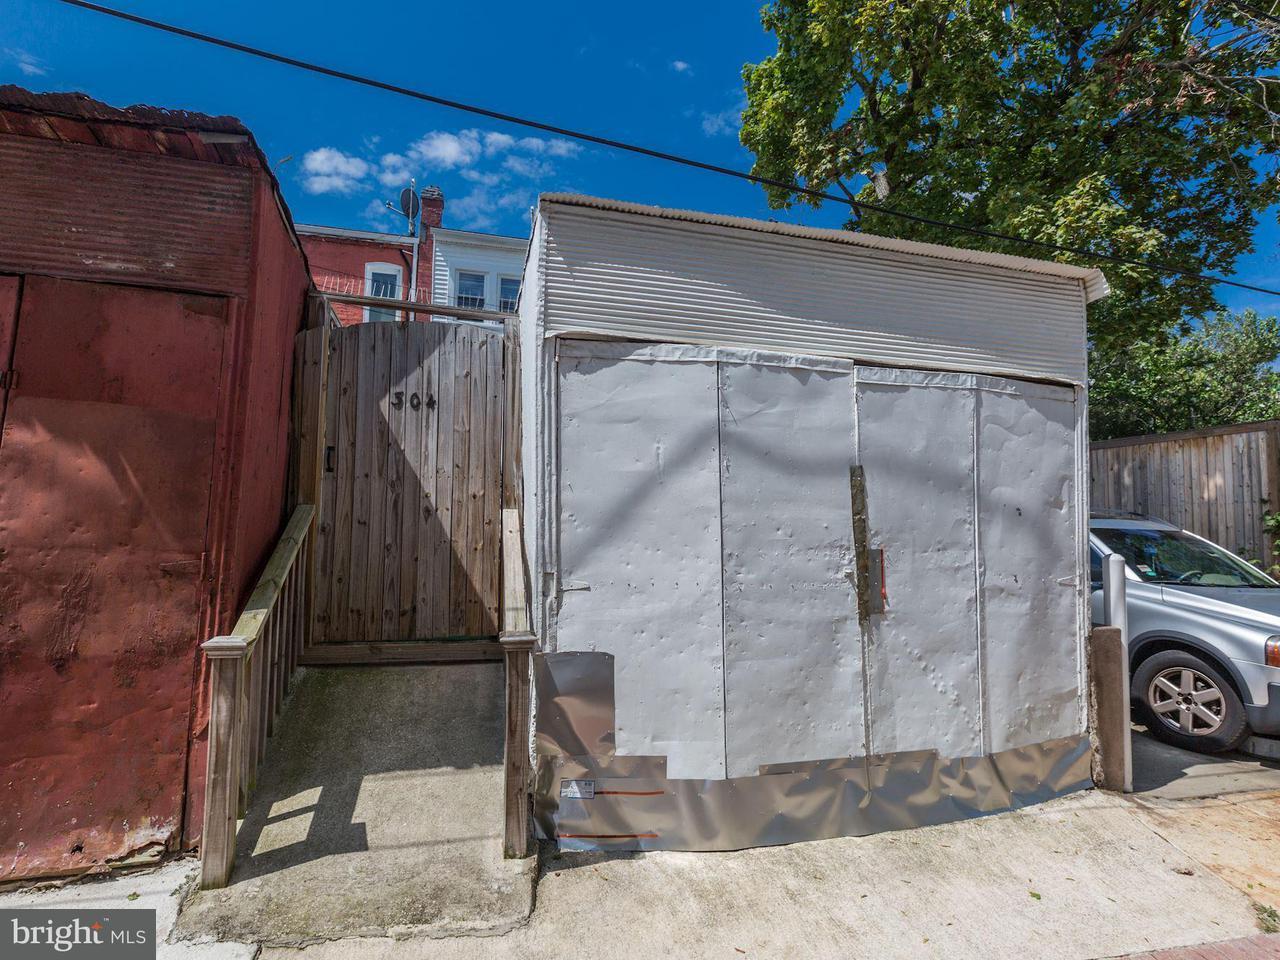 Additional photo for property listing at 304 16th St Se 304 16th St Se Washington, Περιφερεια Τησ Κολουμπια 20003 Ηνωμενεσ Πολιτειεσ